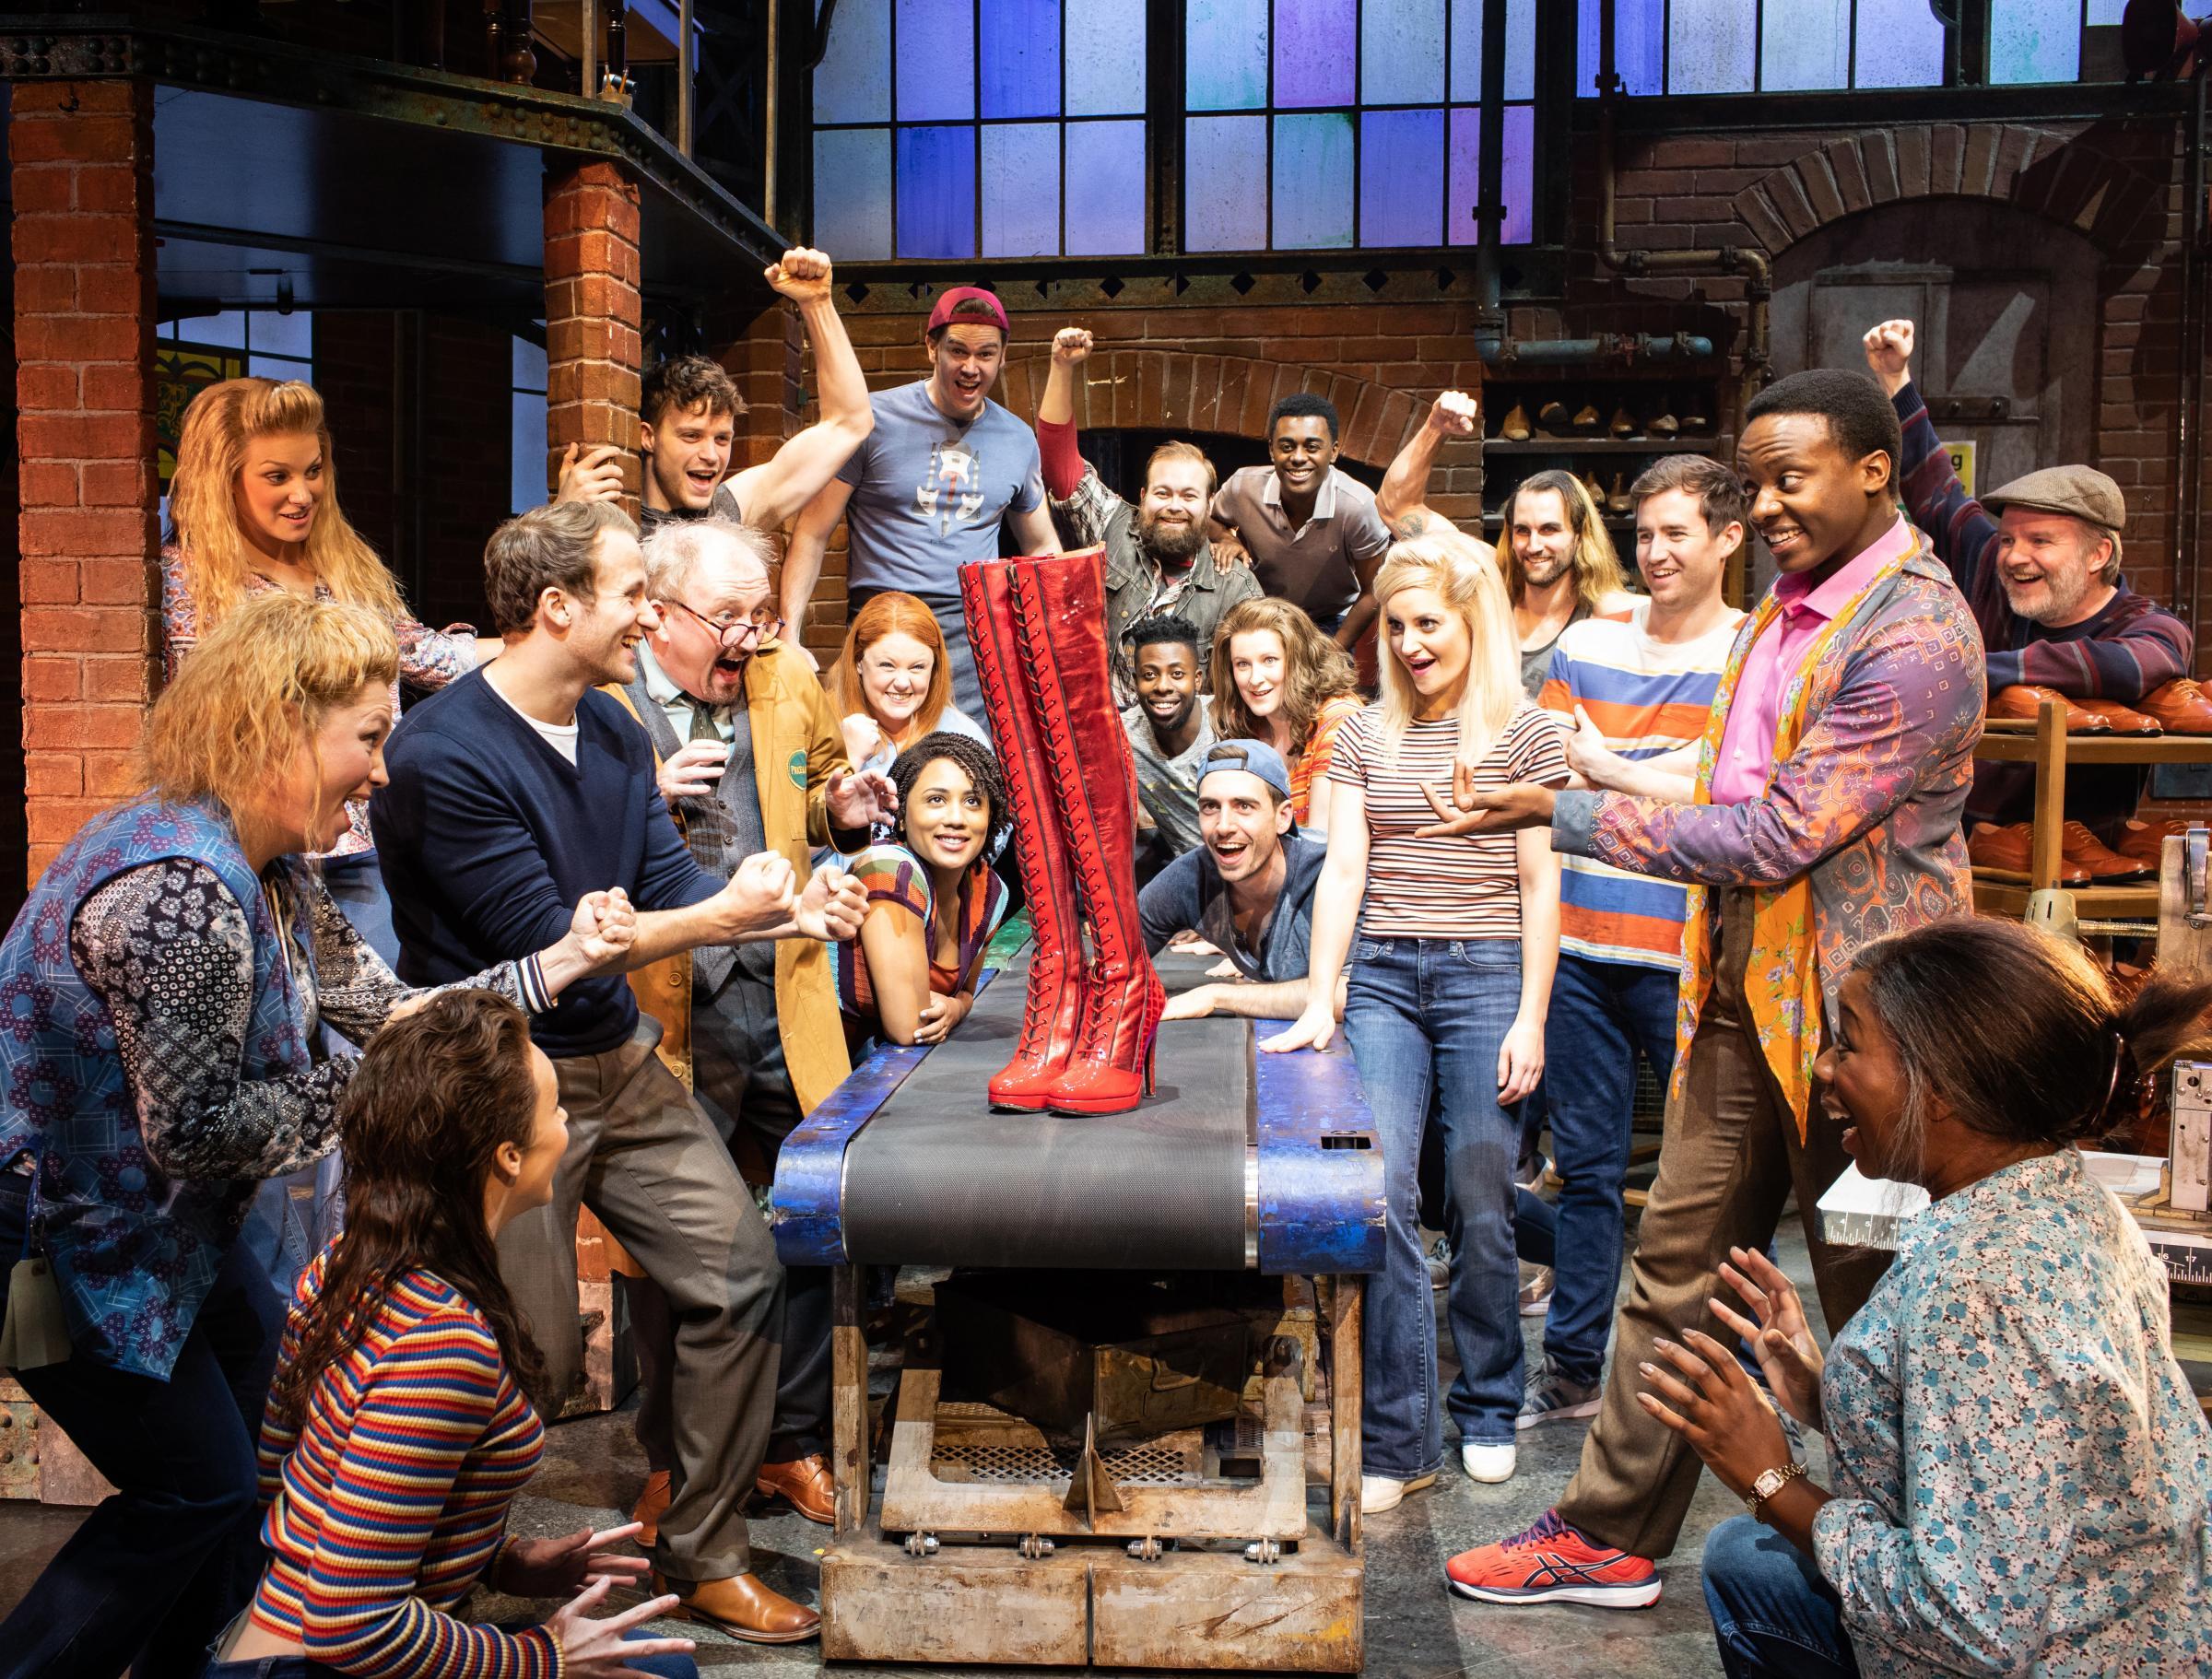 Kinky Boots is well-heeled success